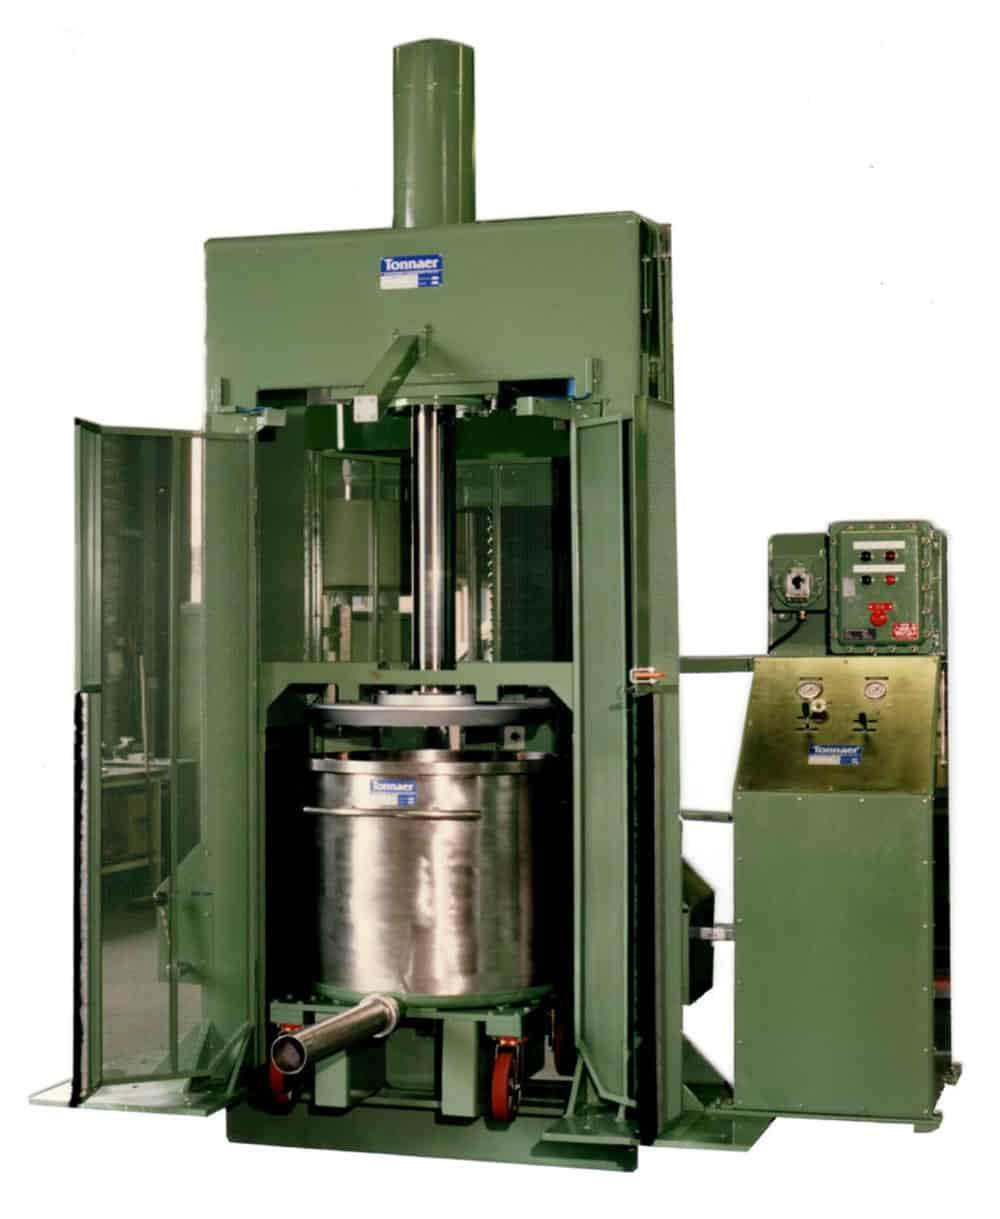 Tub press 02 Tonnaer Mixing Systems